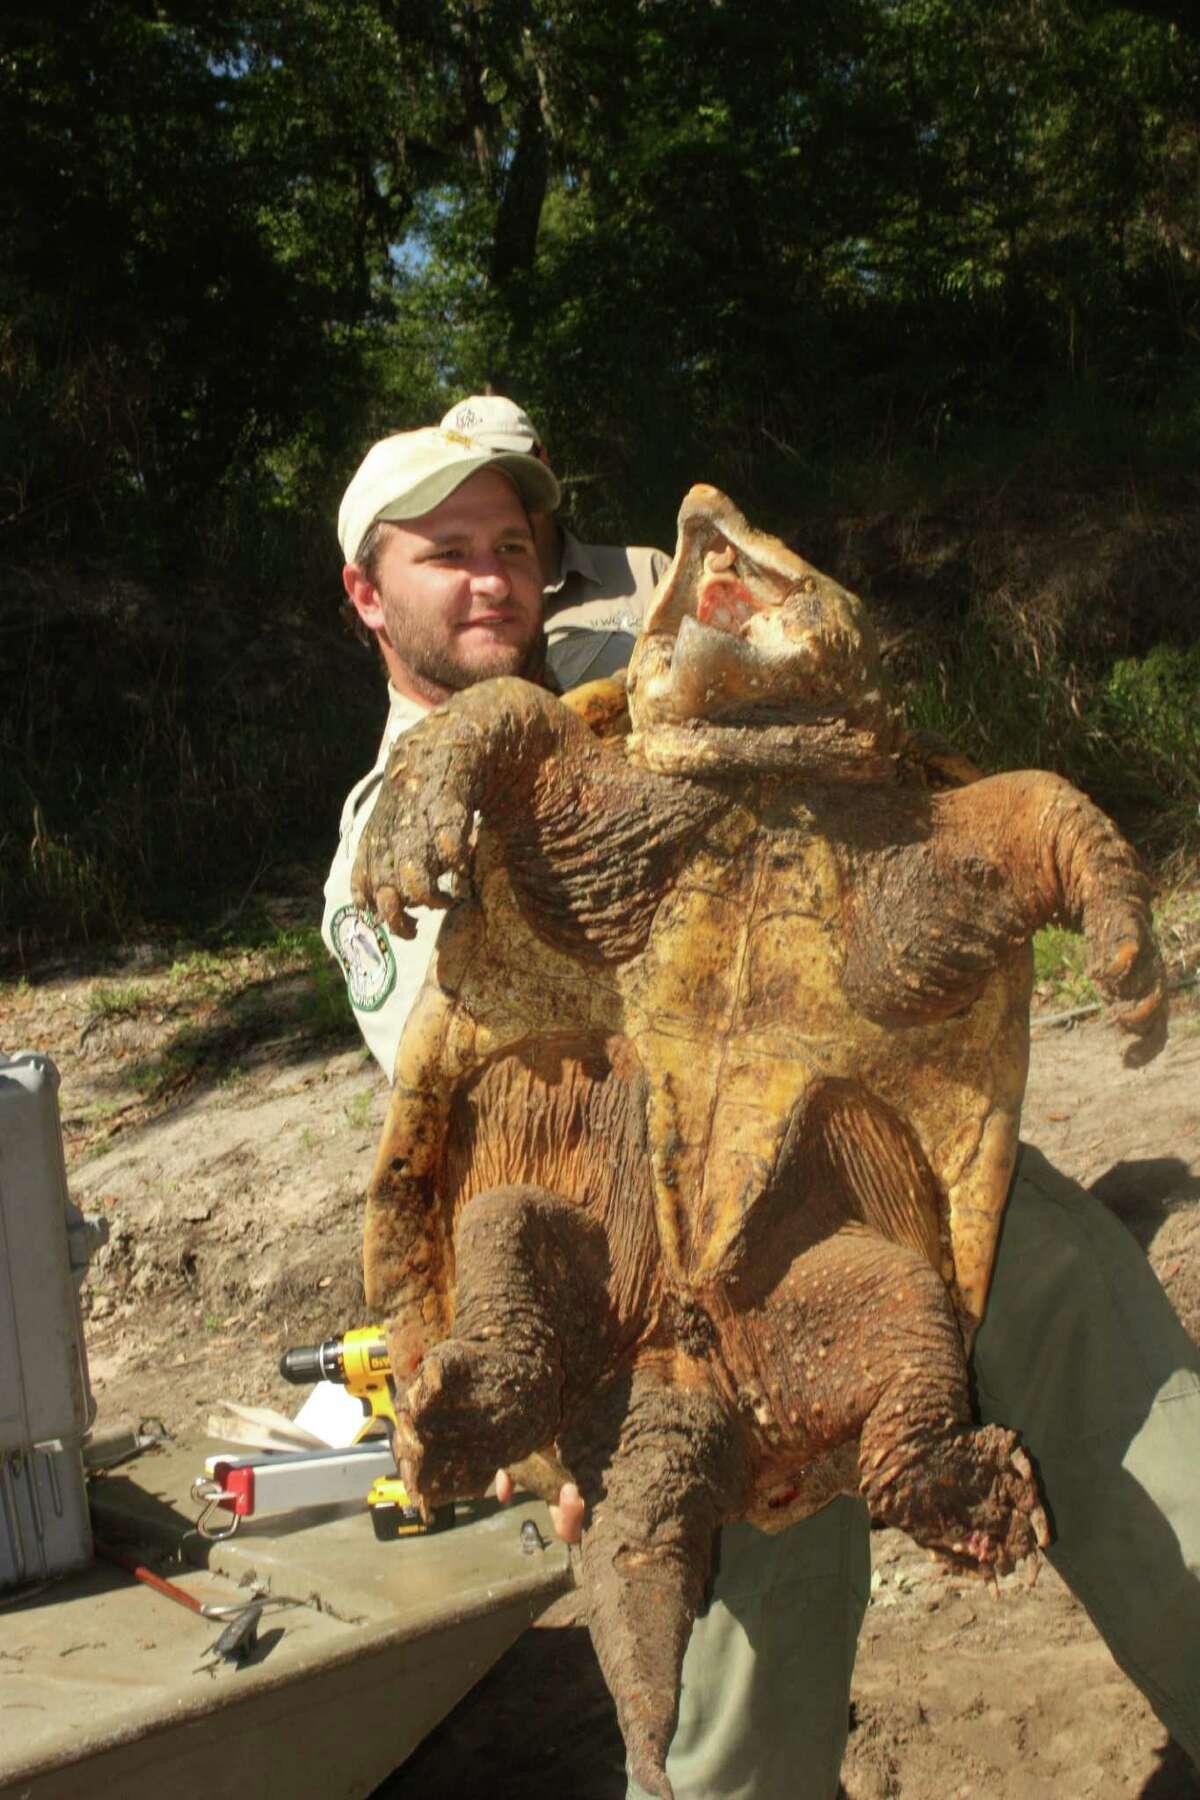 Travis Thomas hoists a 130-pound Suwannee alligator snapping turtle.